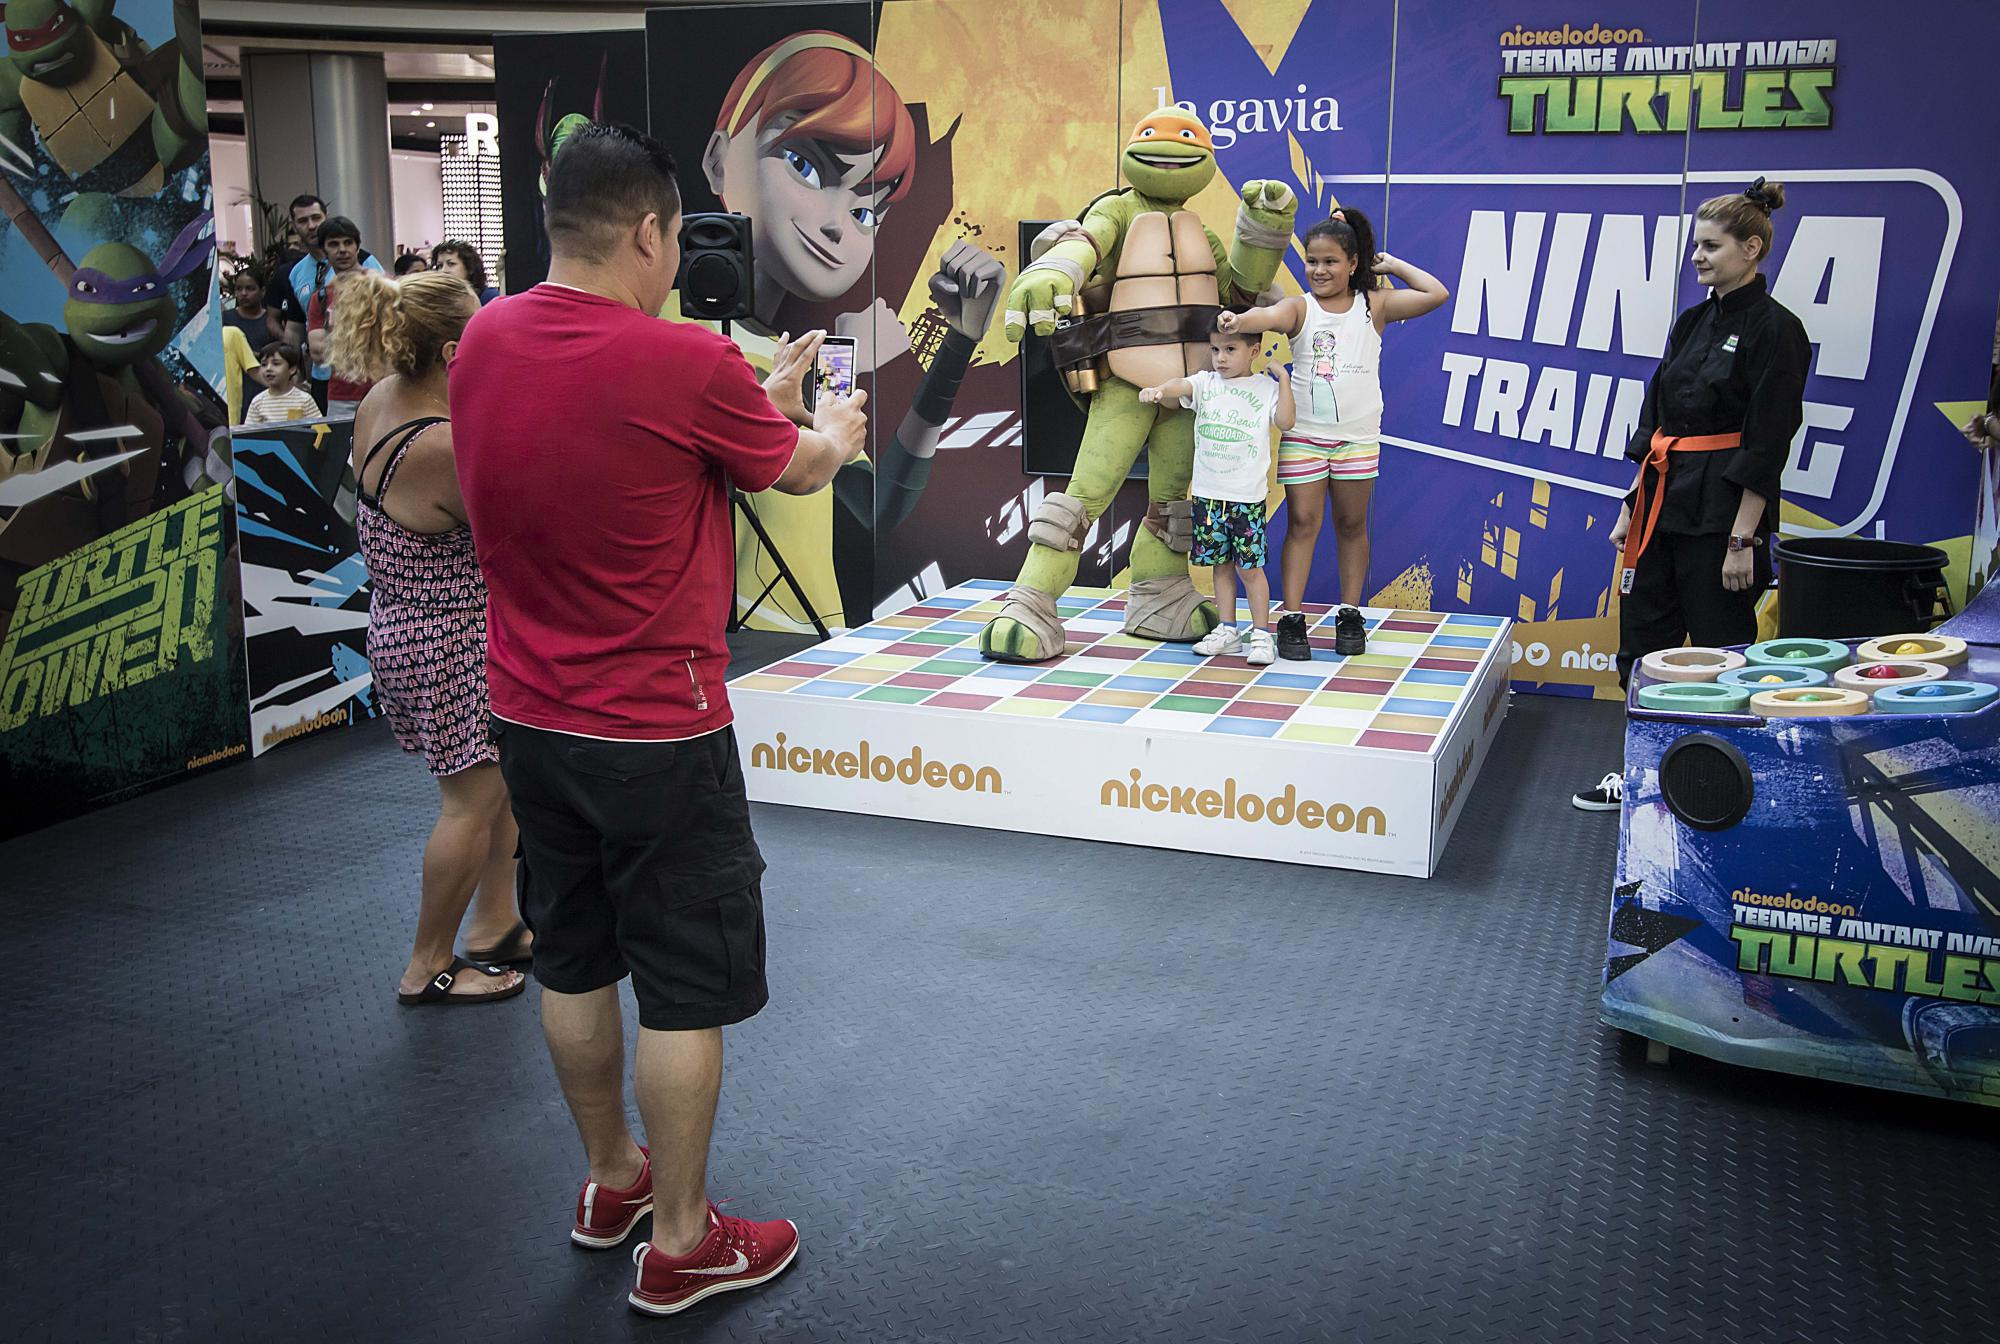 El 'Nickelodeon Tour 2016' llega a Espacio Torrelodones